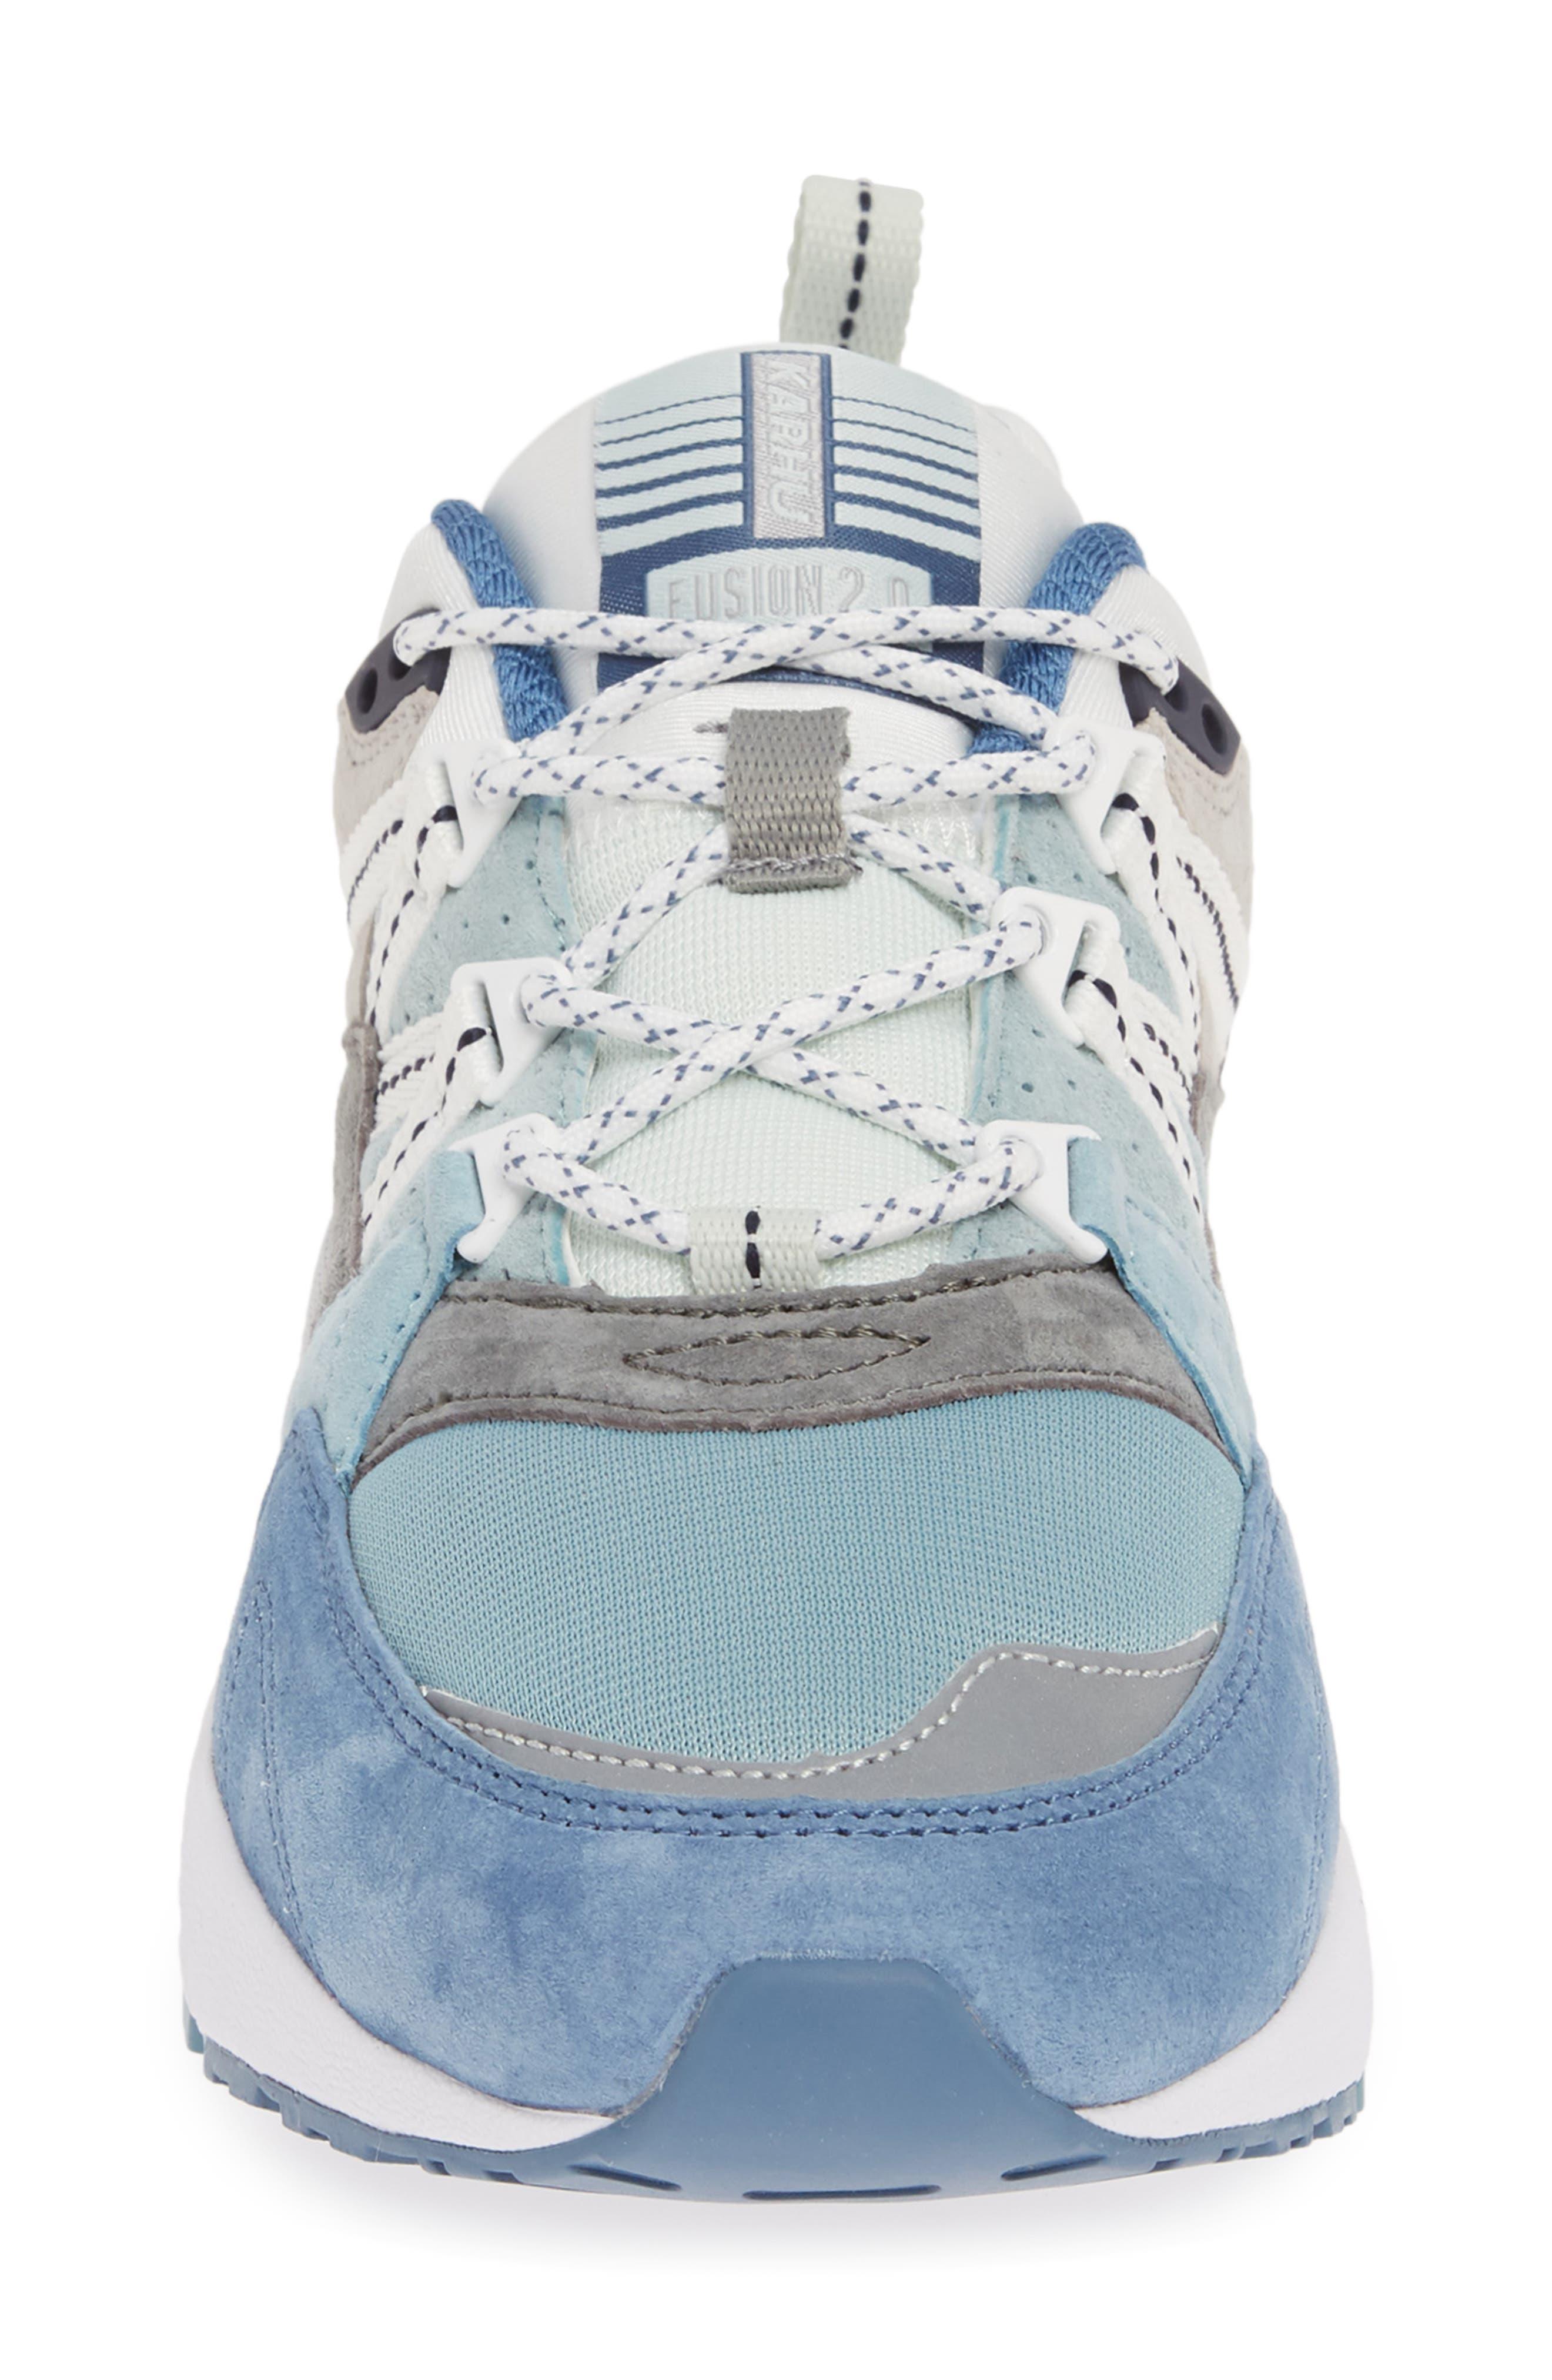 Fusion 2.0 Sneaker,                             Alternate thumbnail 4, color,                             210